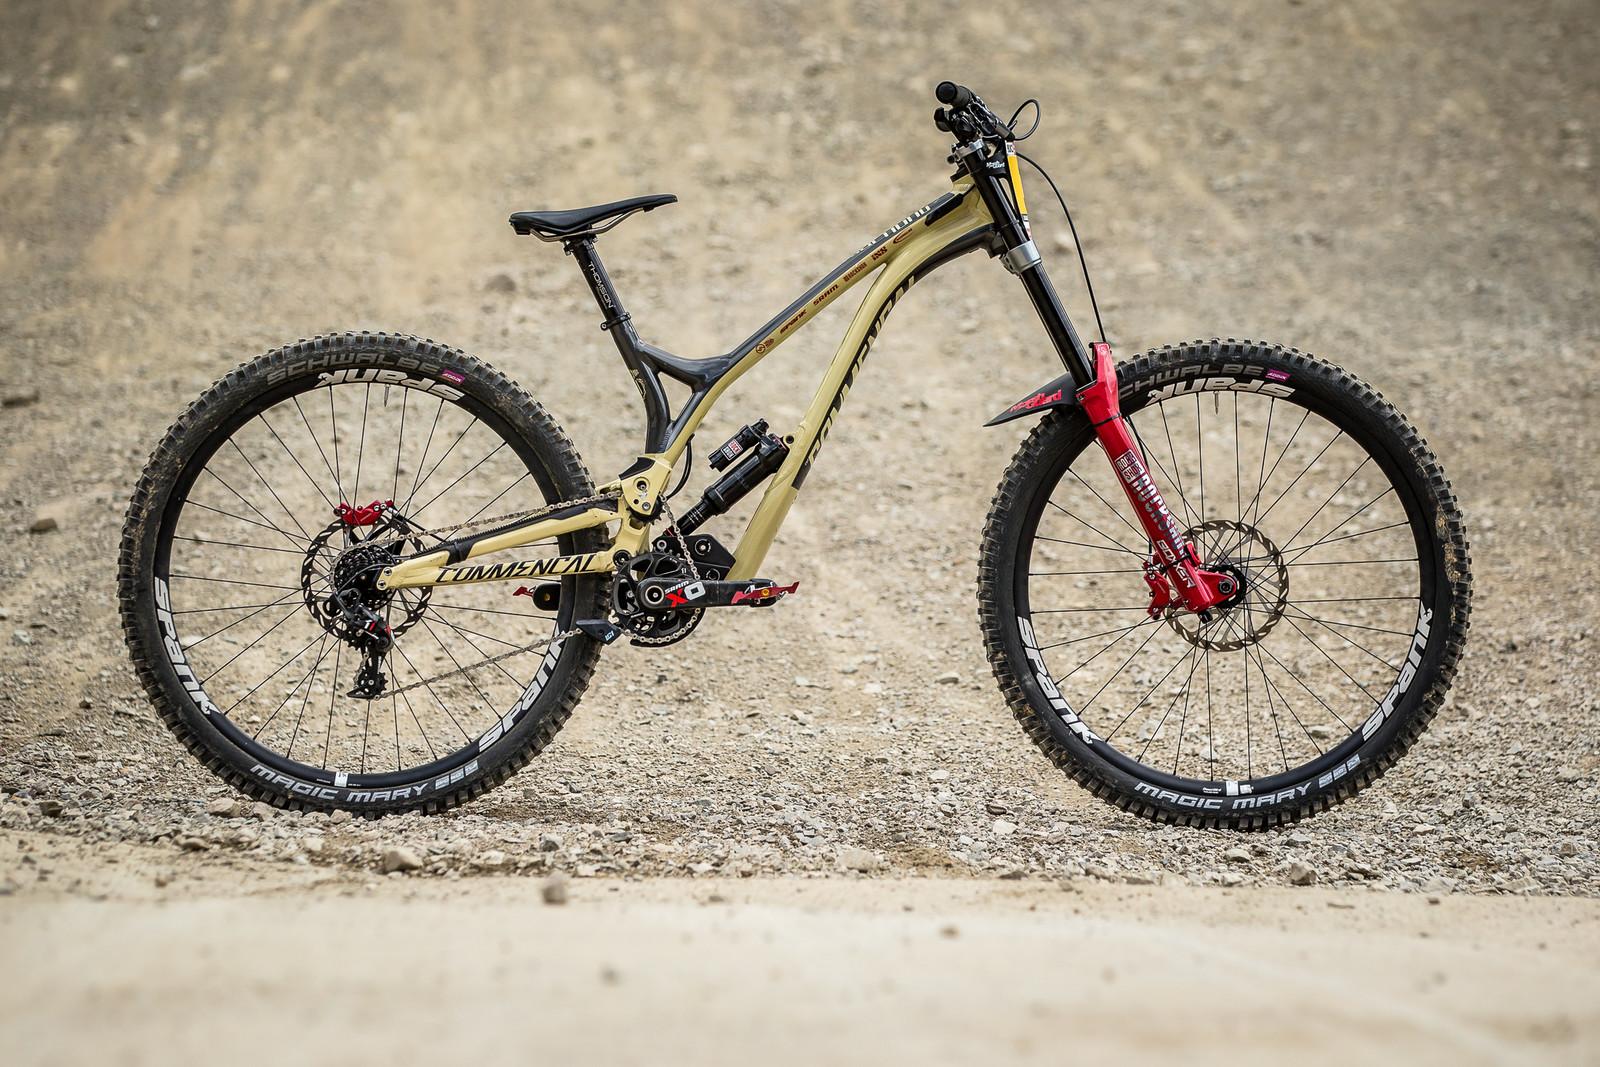 WINNING BIKE - Amaury Pierron's Commencal Supreme DH 29 - WINNING BIKE - Amaury Pierron's Commencal Supreme DH 29 - Mountain Biking Pictures - Vital MTB